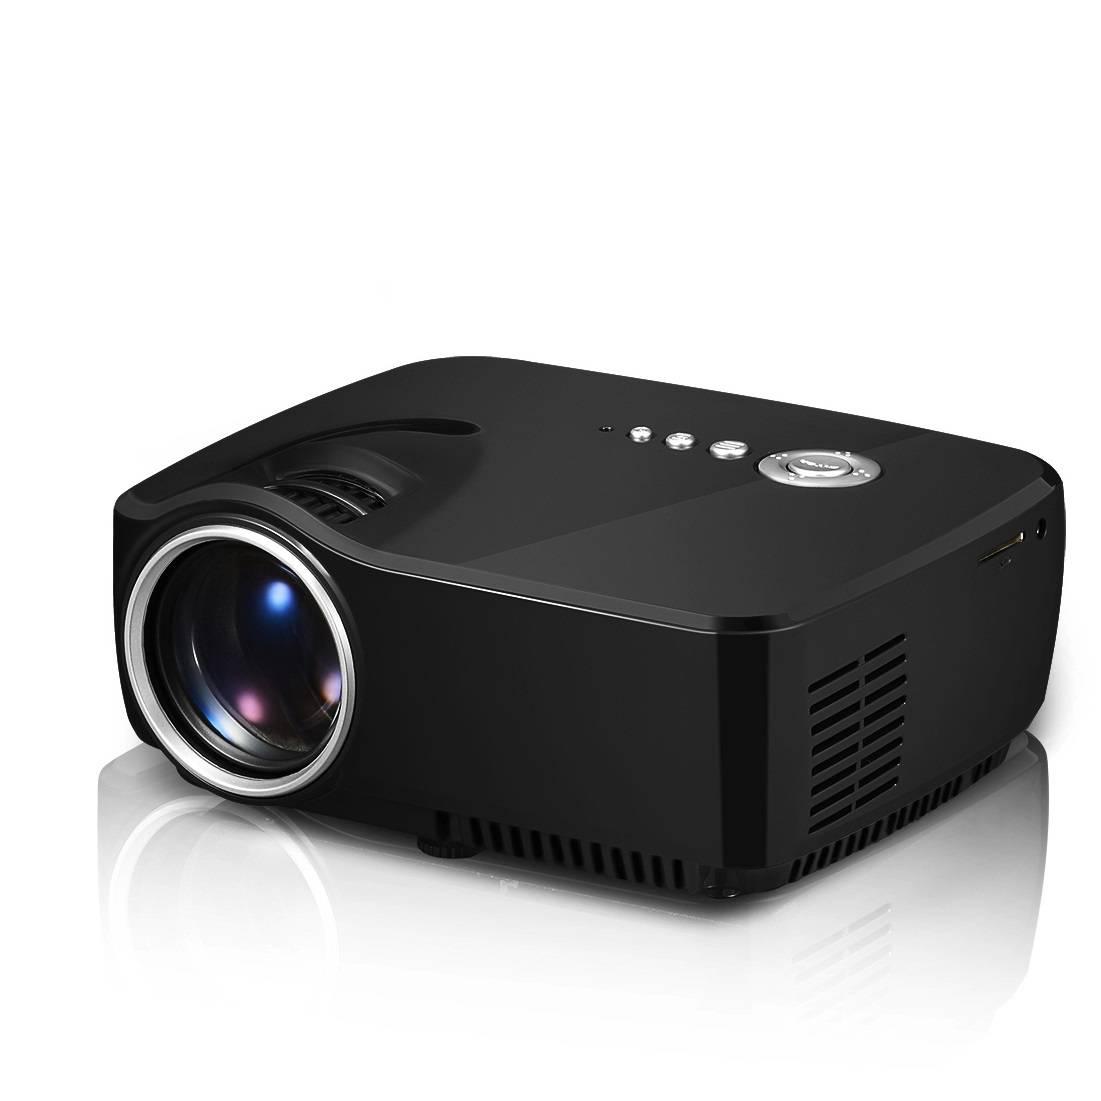 Simplebamer high quality projectors